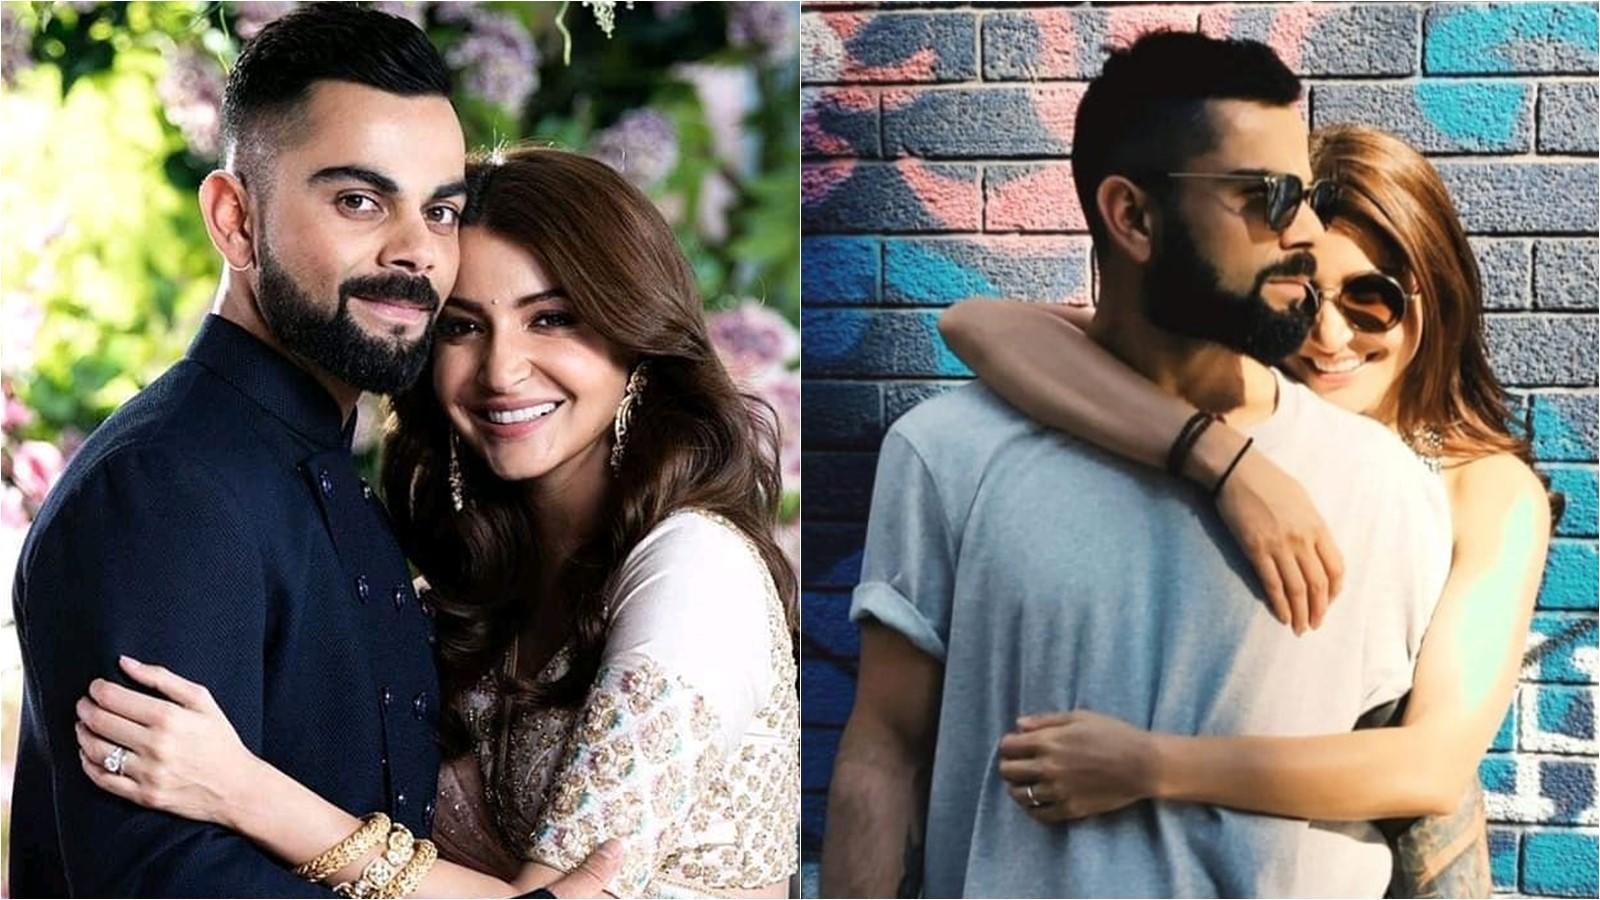 virat-kohli-credits-wife-anushka-sharma-for-turning-him-into-a-better-person